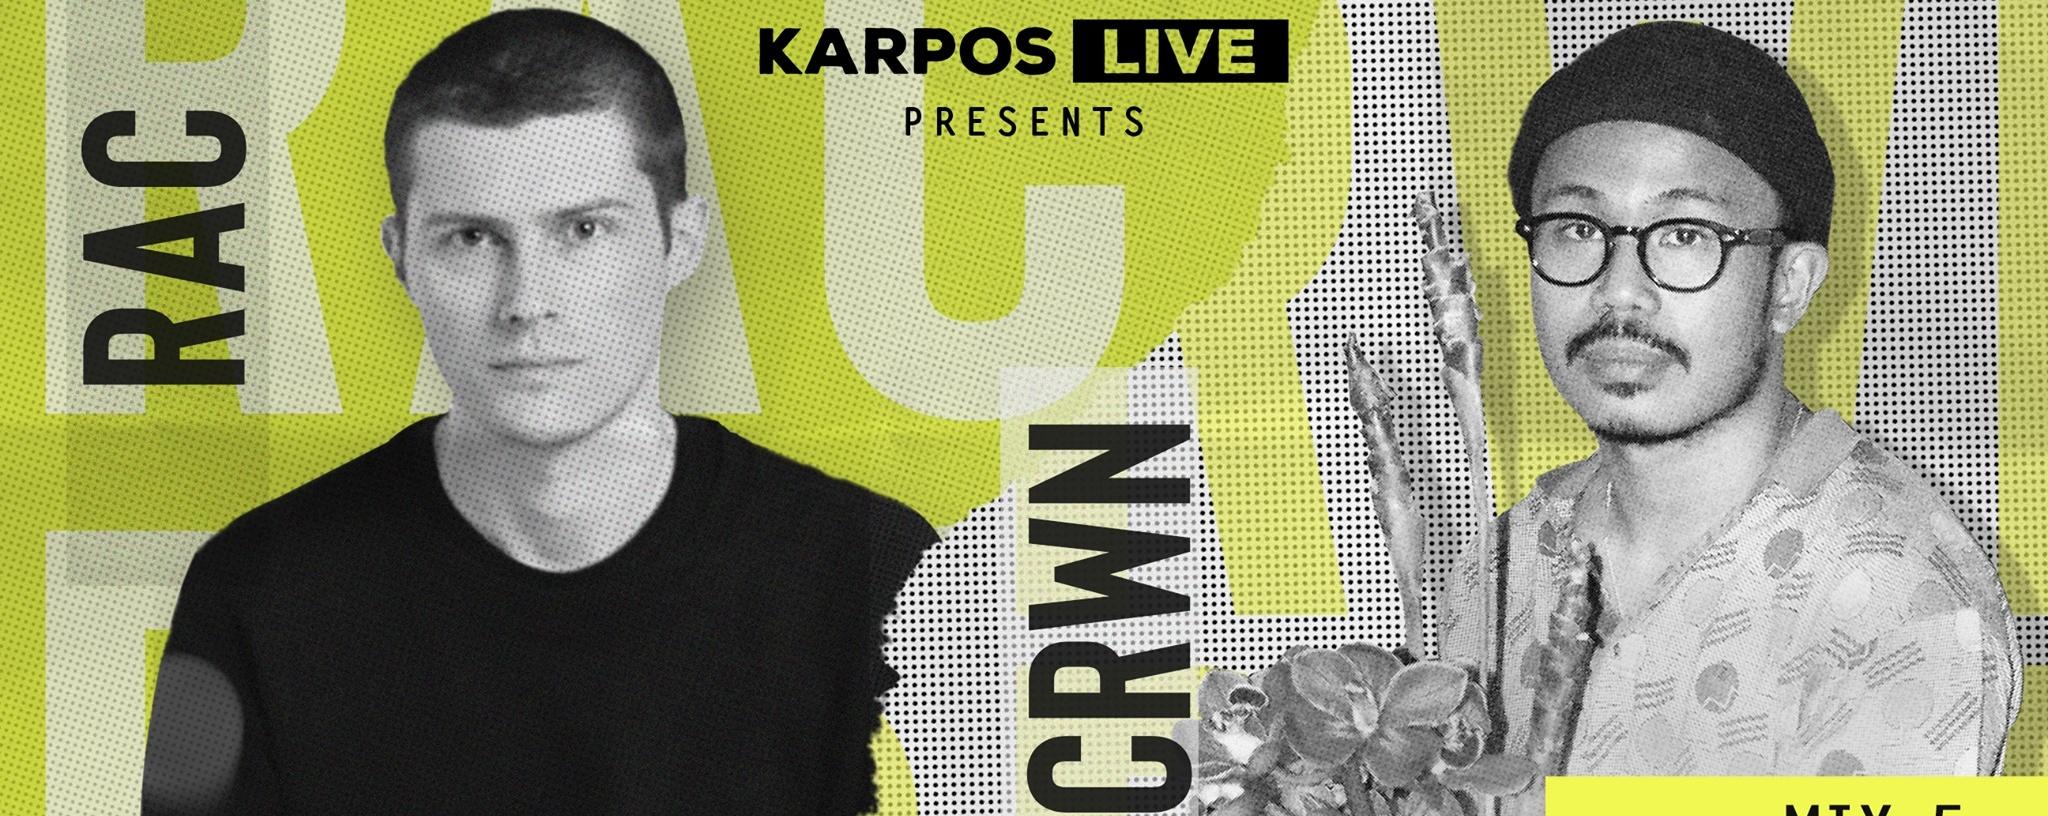 Karpos Live Mix 4: RAC + CRWN